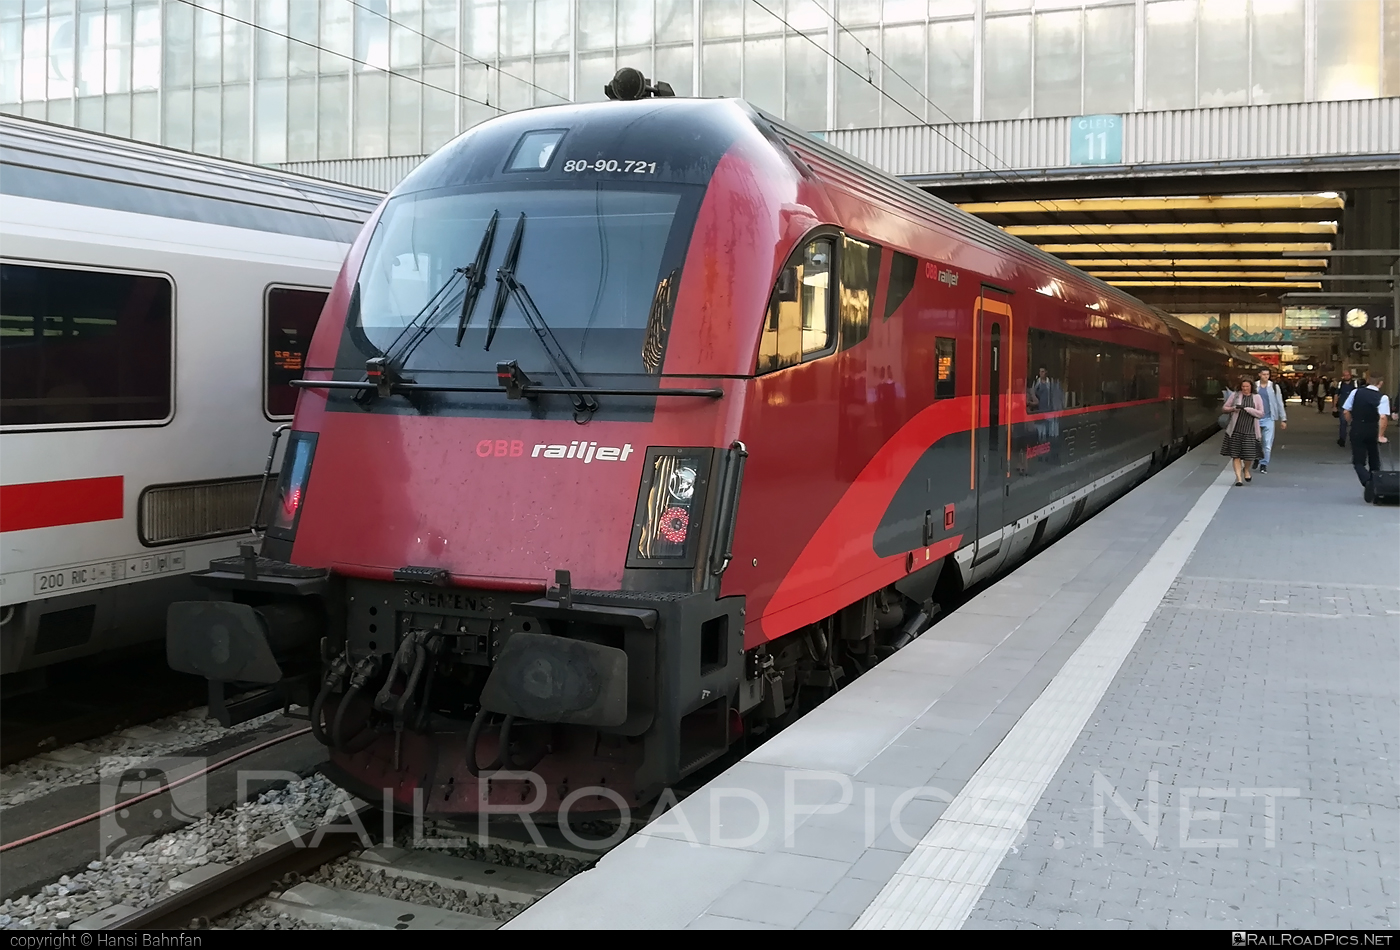 Class A - Afmpz 80-90 control car - 80-90.721 operated by Österreichische Bundesbahnen #afmpz #obb #obbrailjet #osterreichischebundesbahnen #railjet